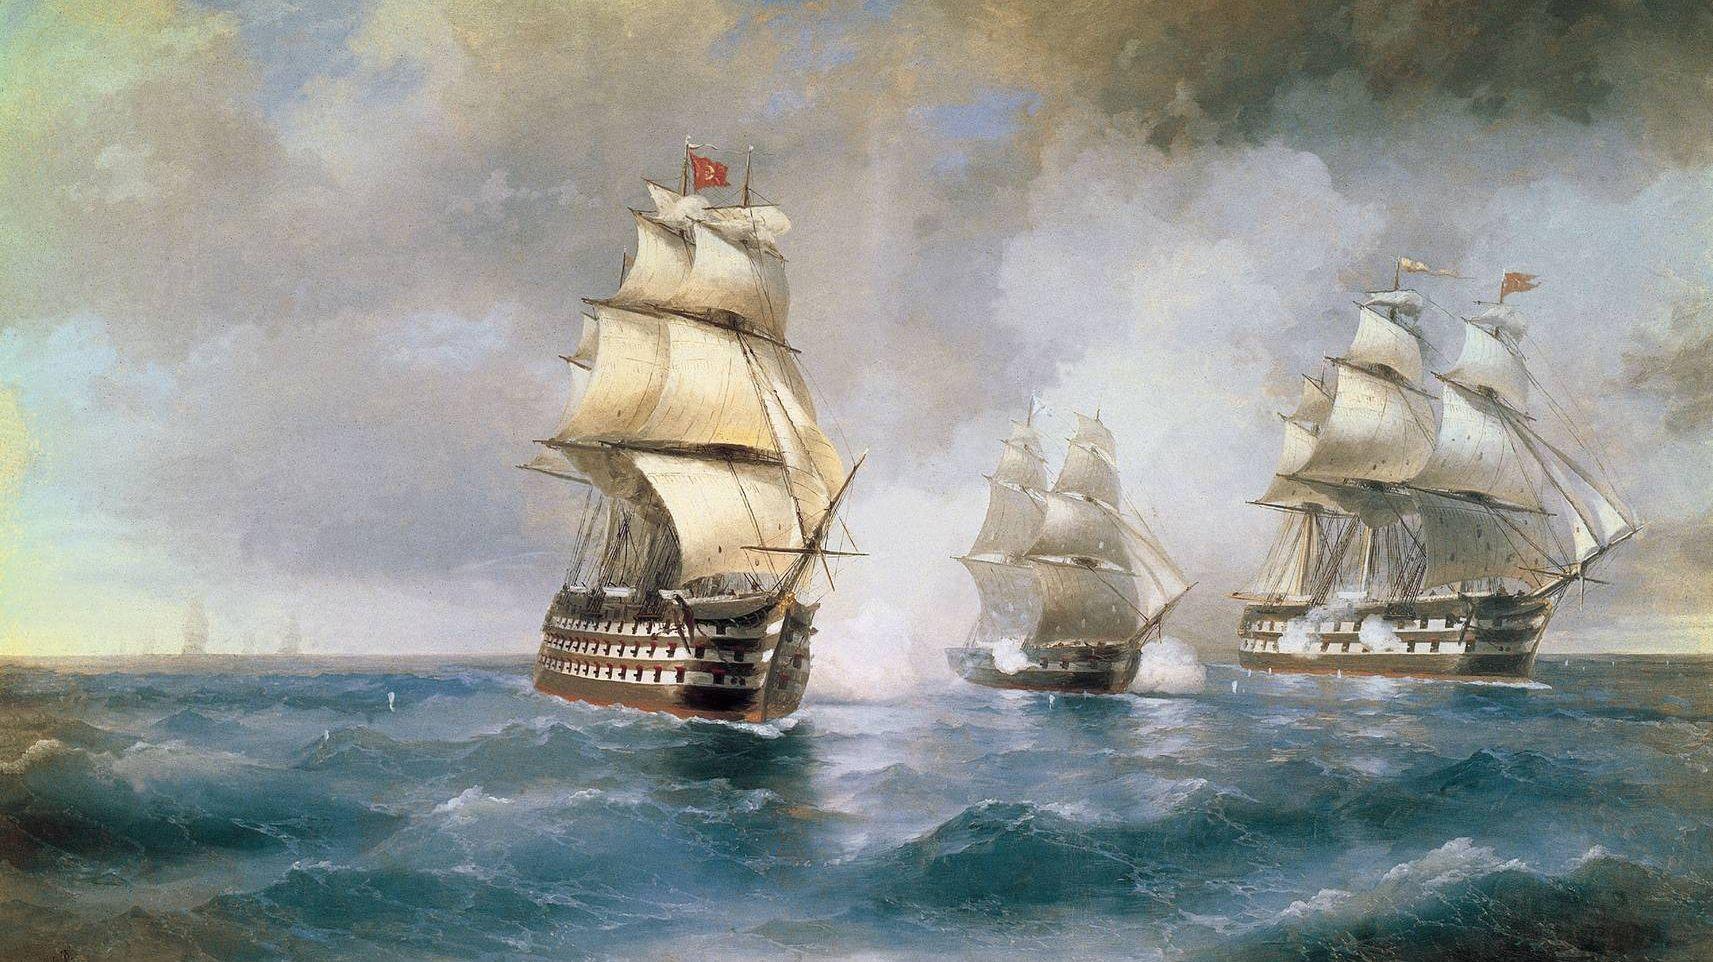 Иван Айвазовский. Бриг «Меркурий», атакованный двумя турецкими кораблями. 1892